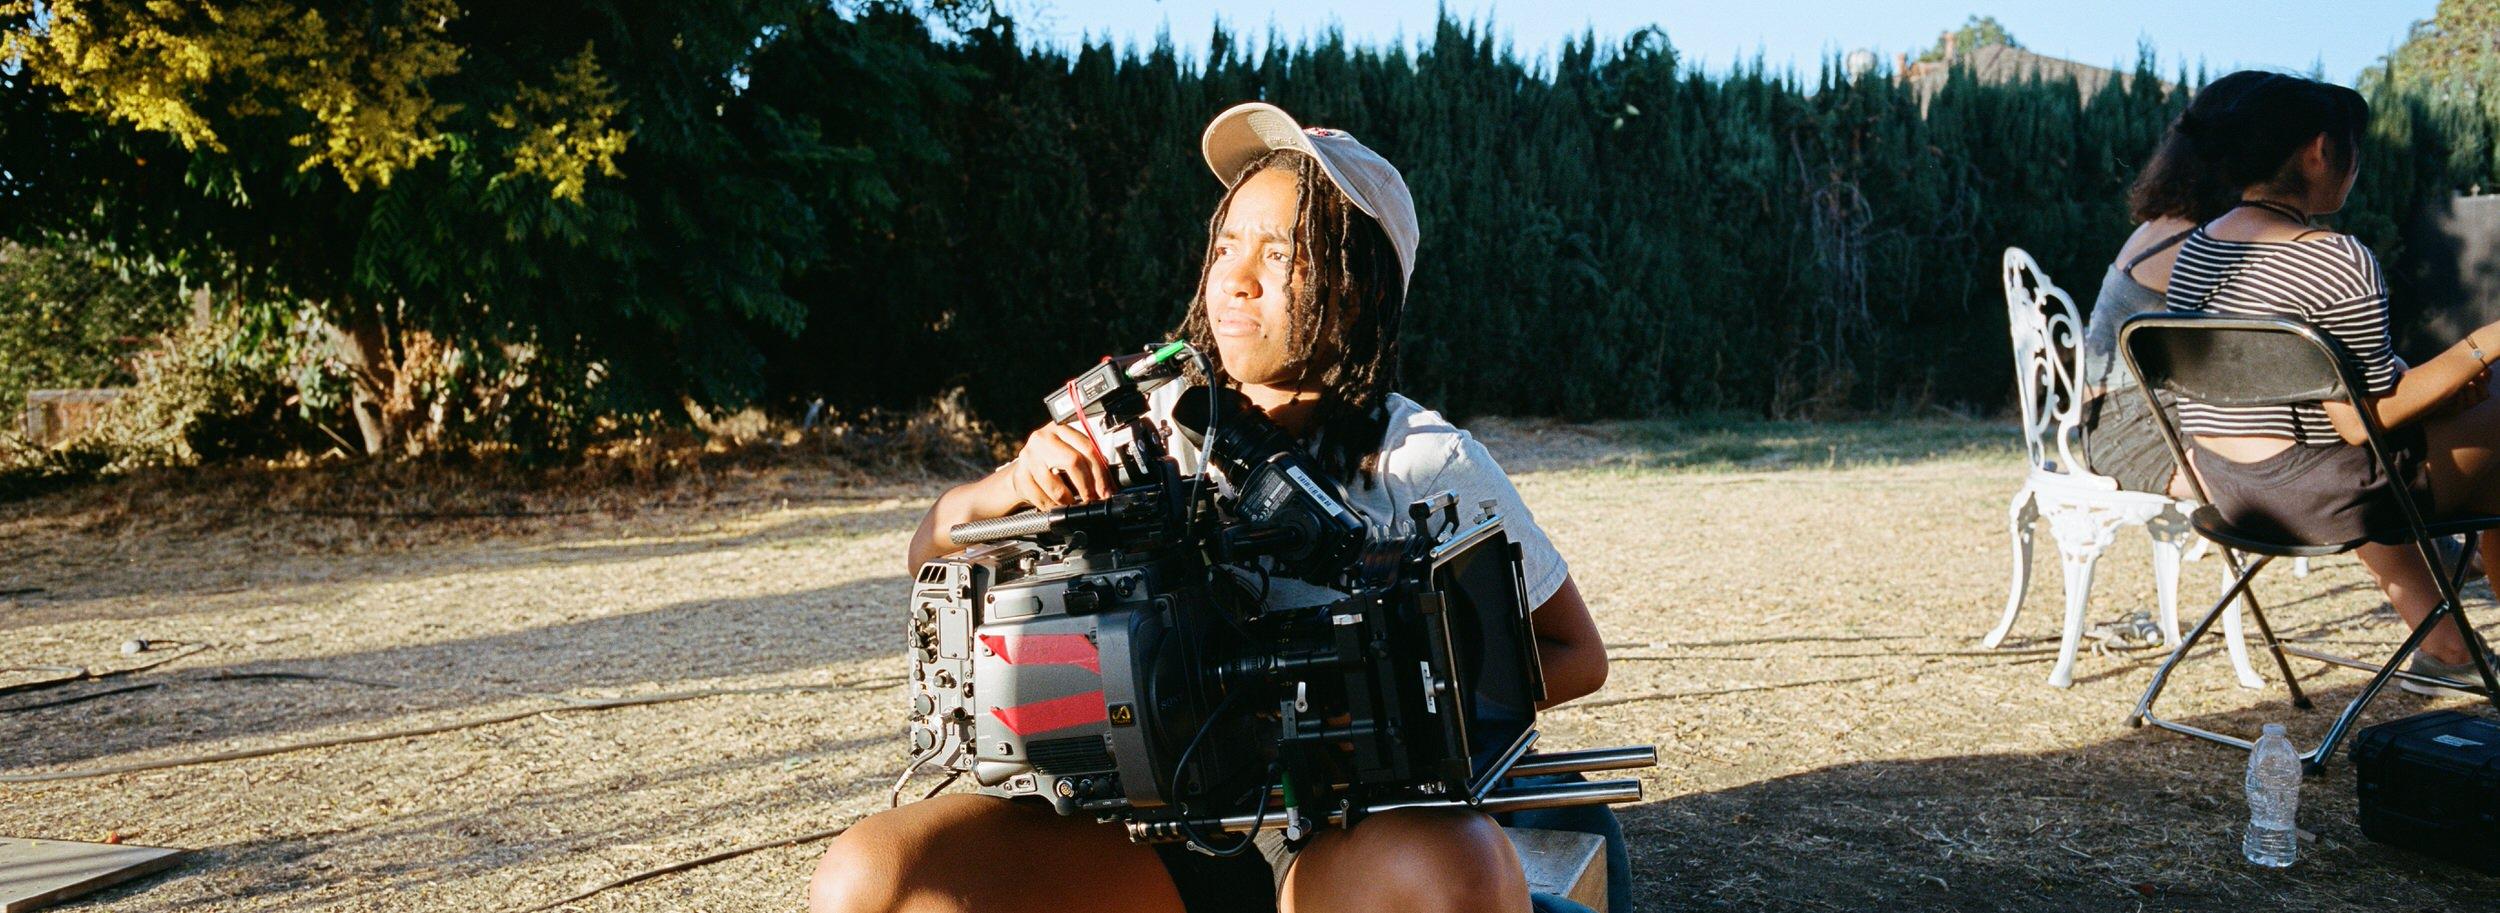 film-objektiv-Kodak-400-panoramic-xpan-2500x913-1.jpg